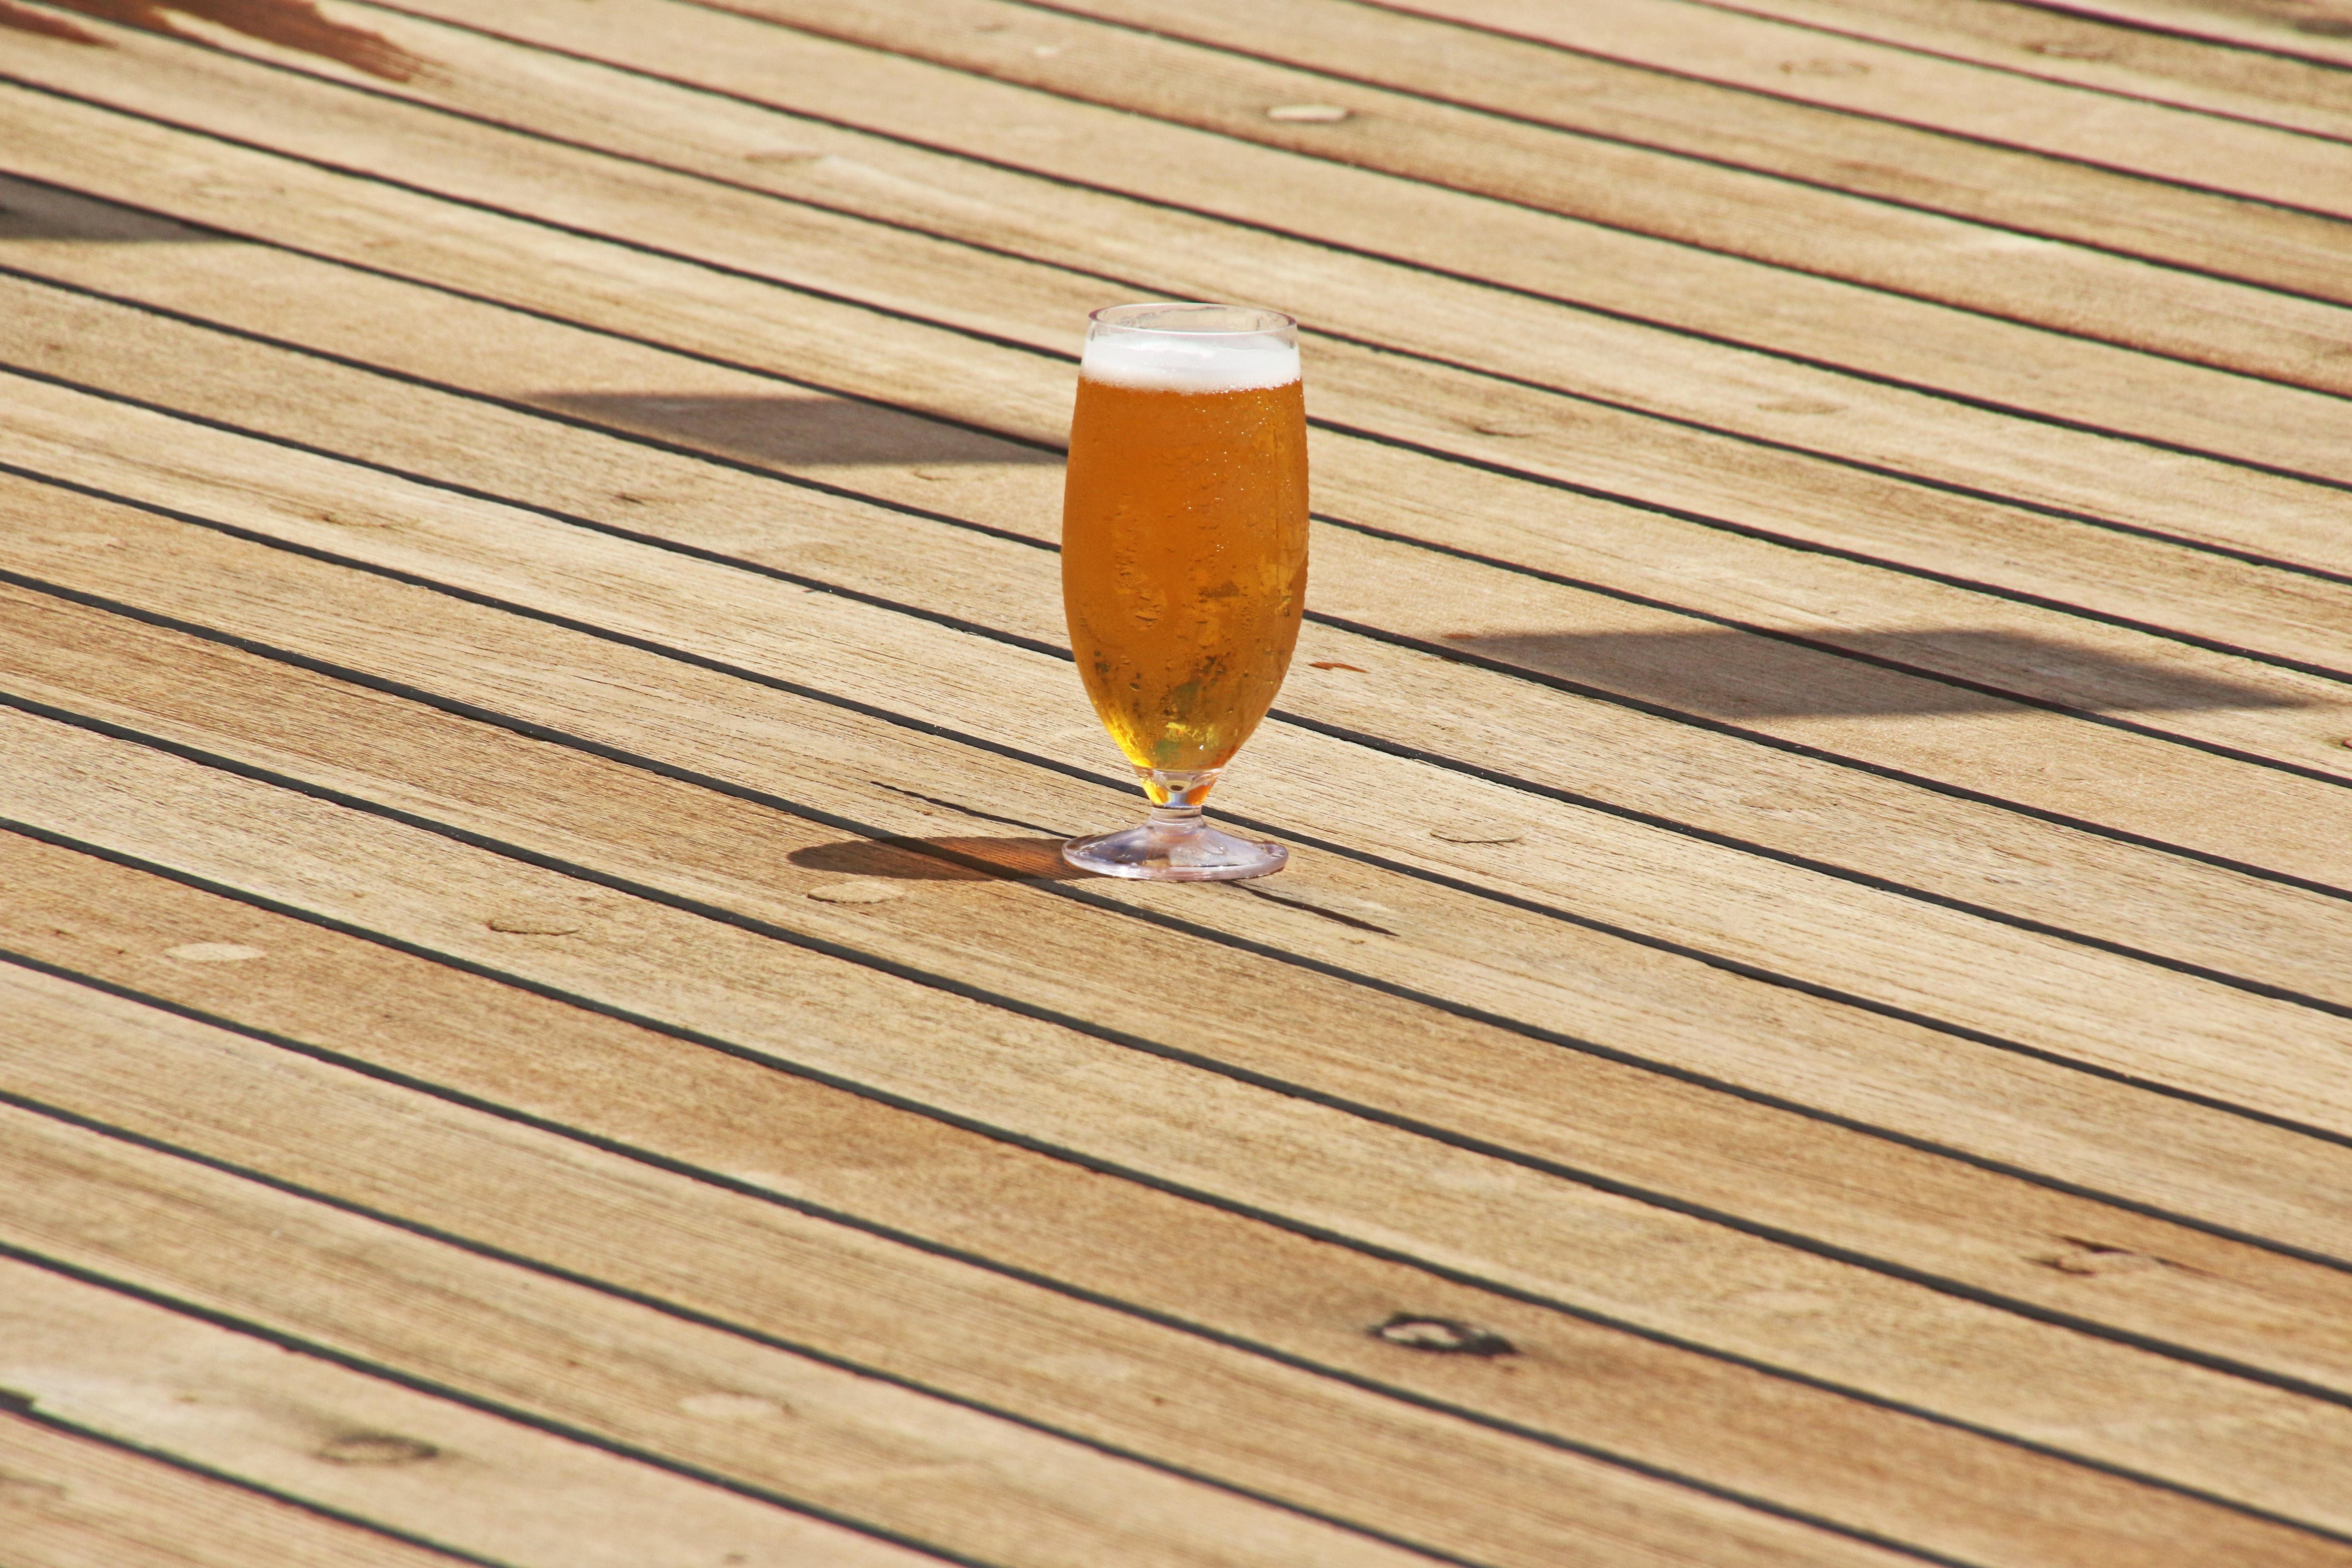 Glass of fresh beer , Beer, Beverage, Drink, Glass, HQ Photo